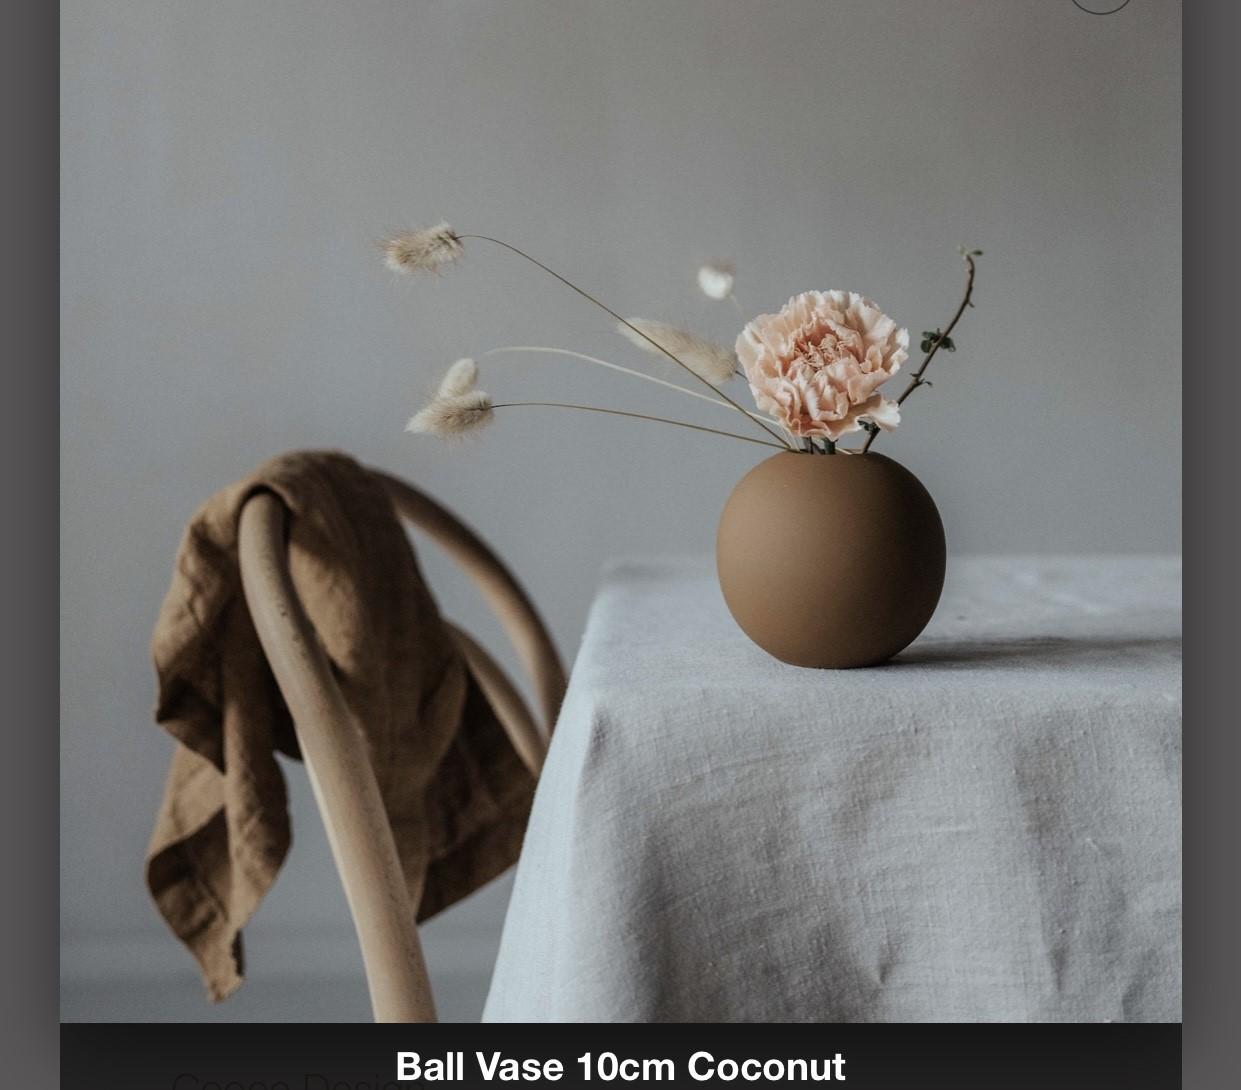 Ballvase 10 cm Coconut